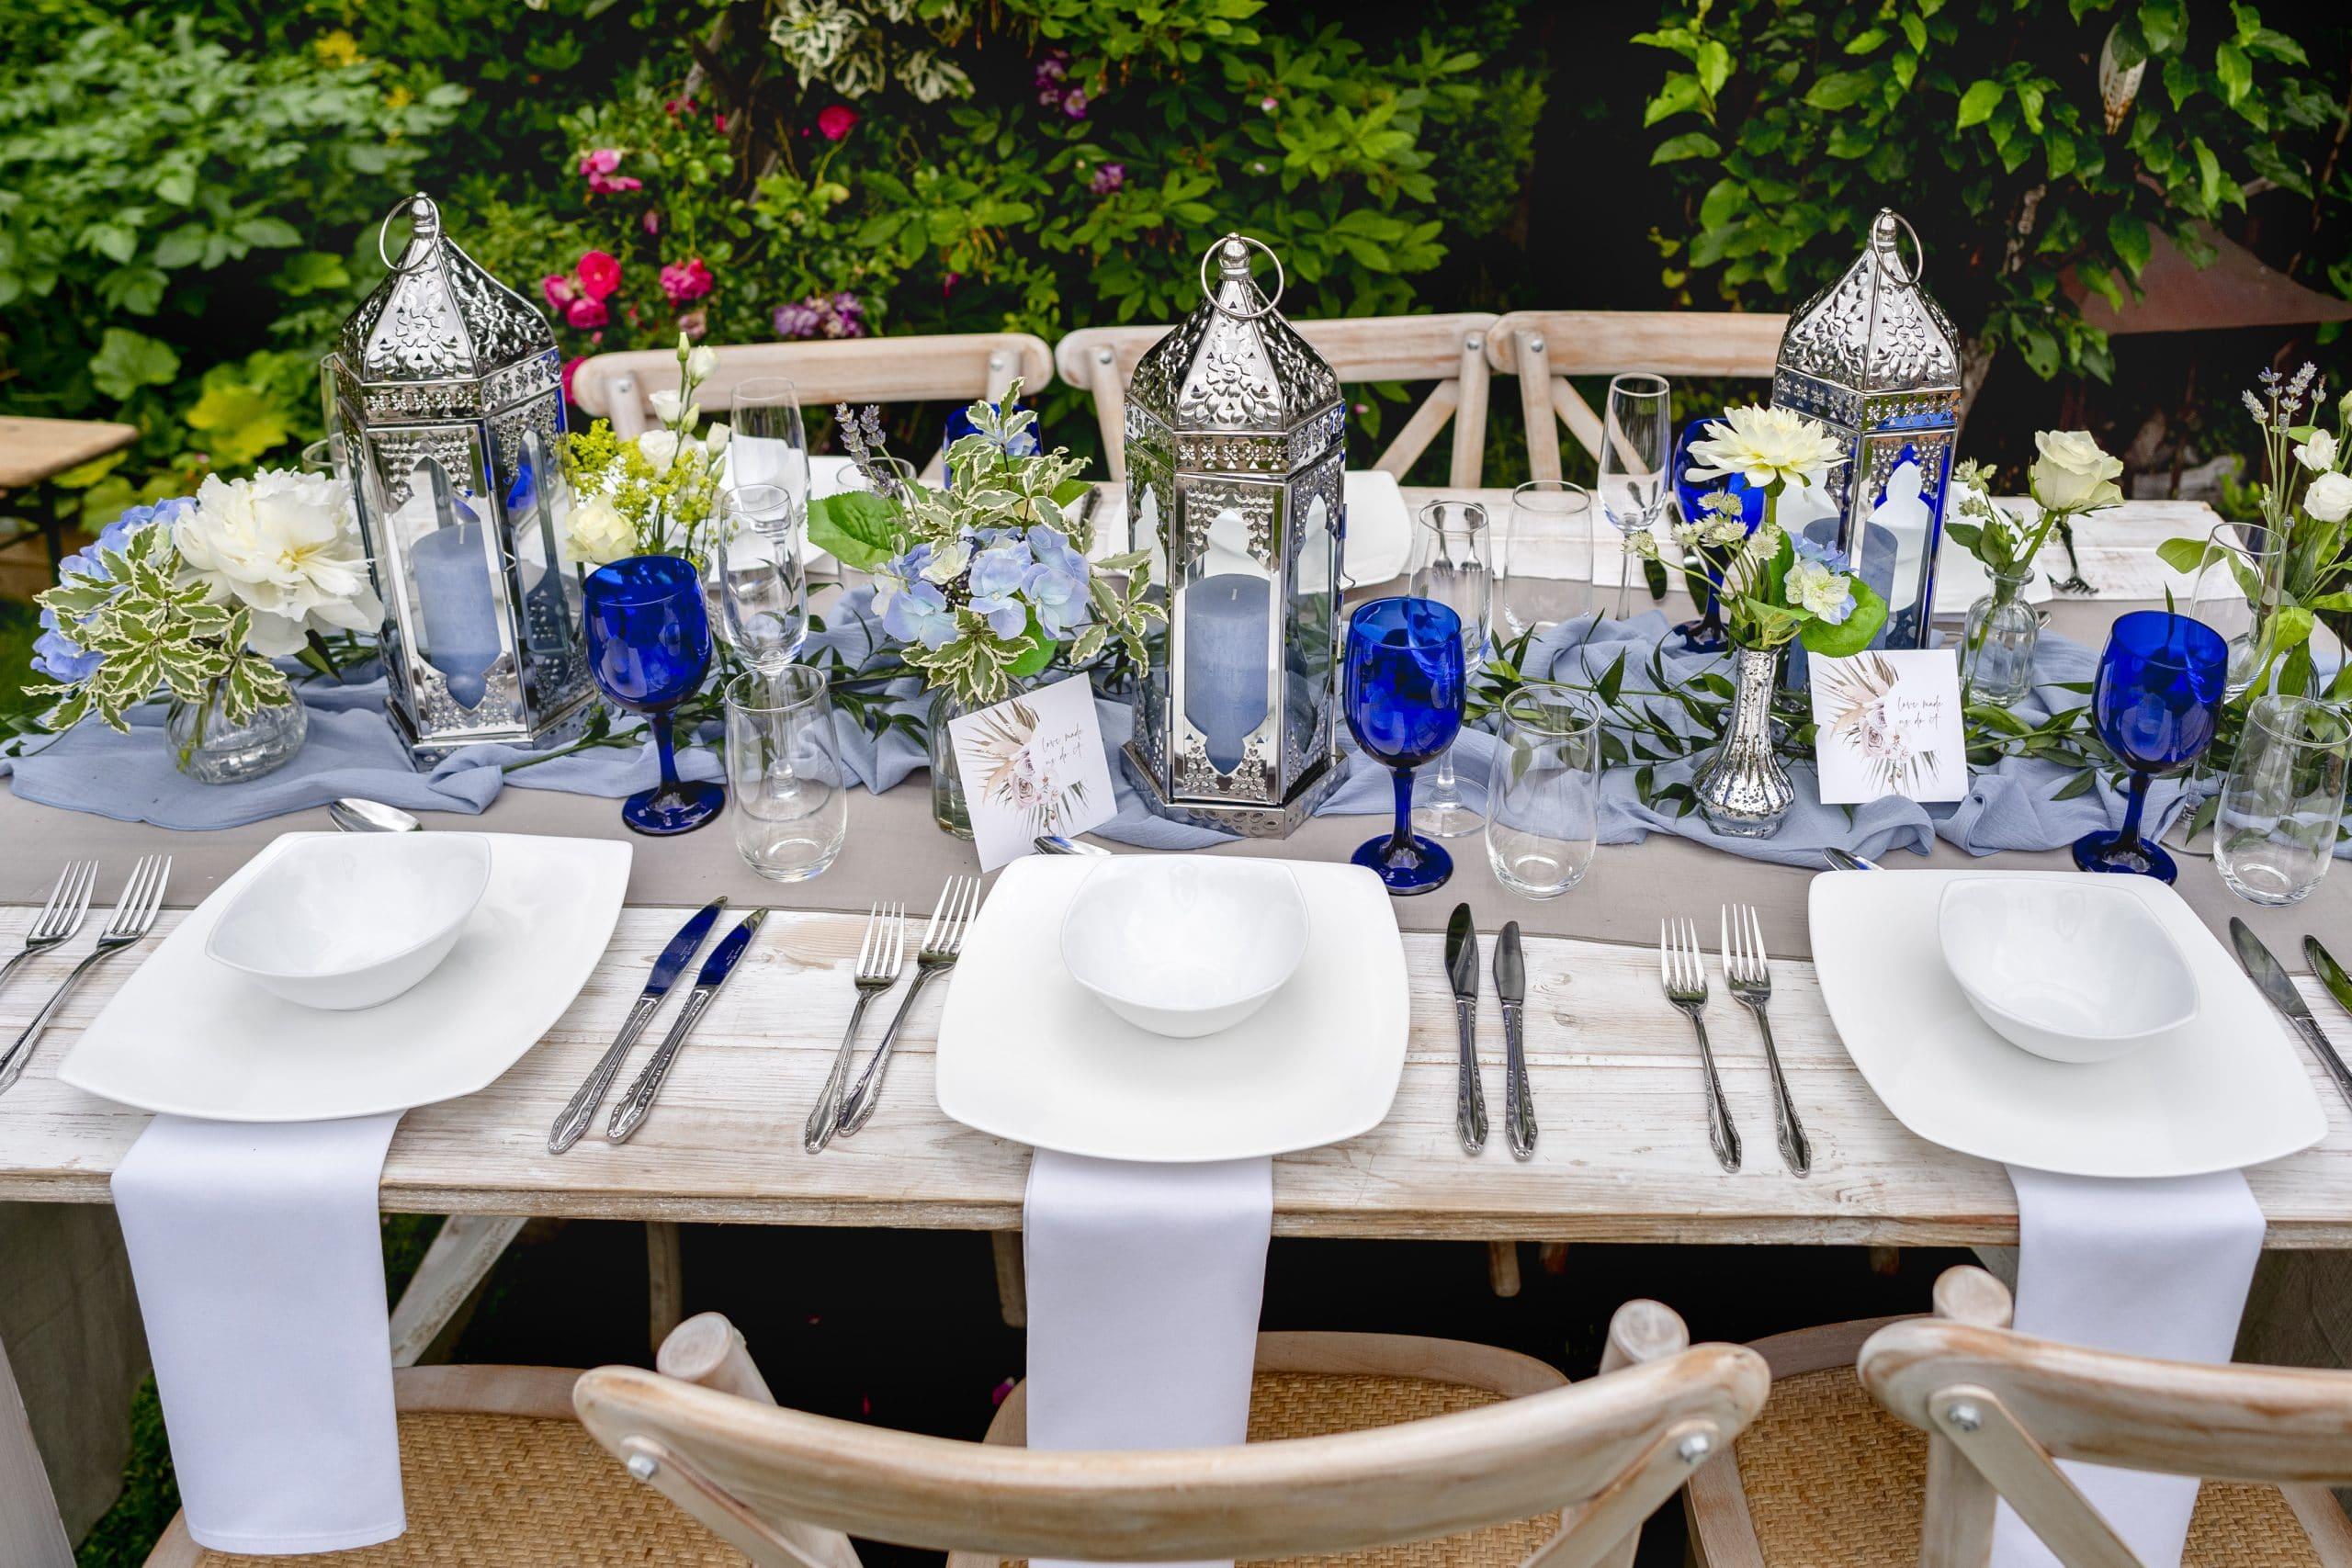 BLUE GOBLET SUMMER WEDDING